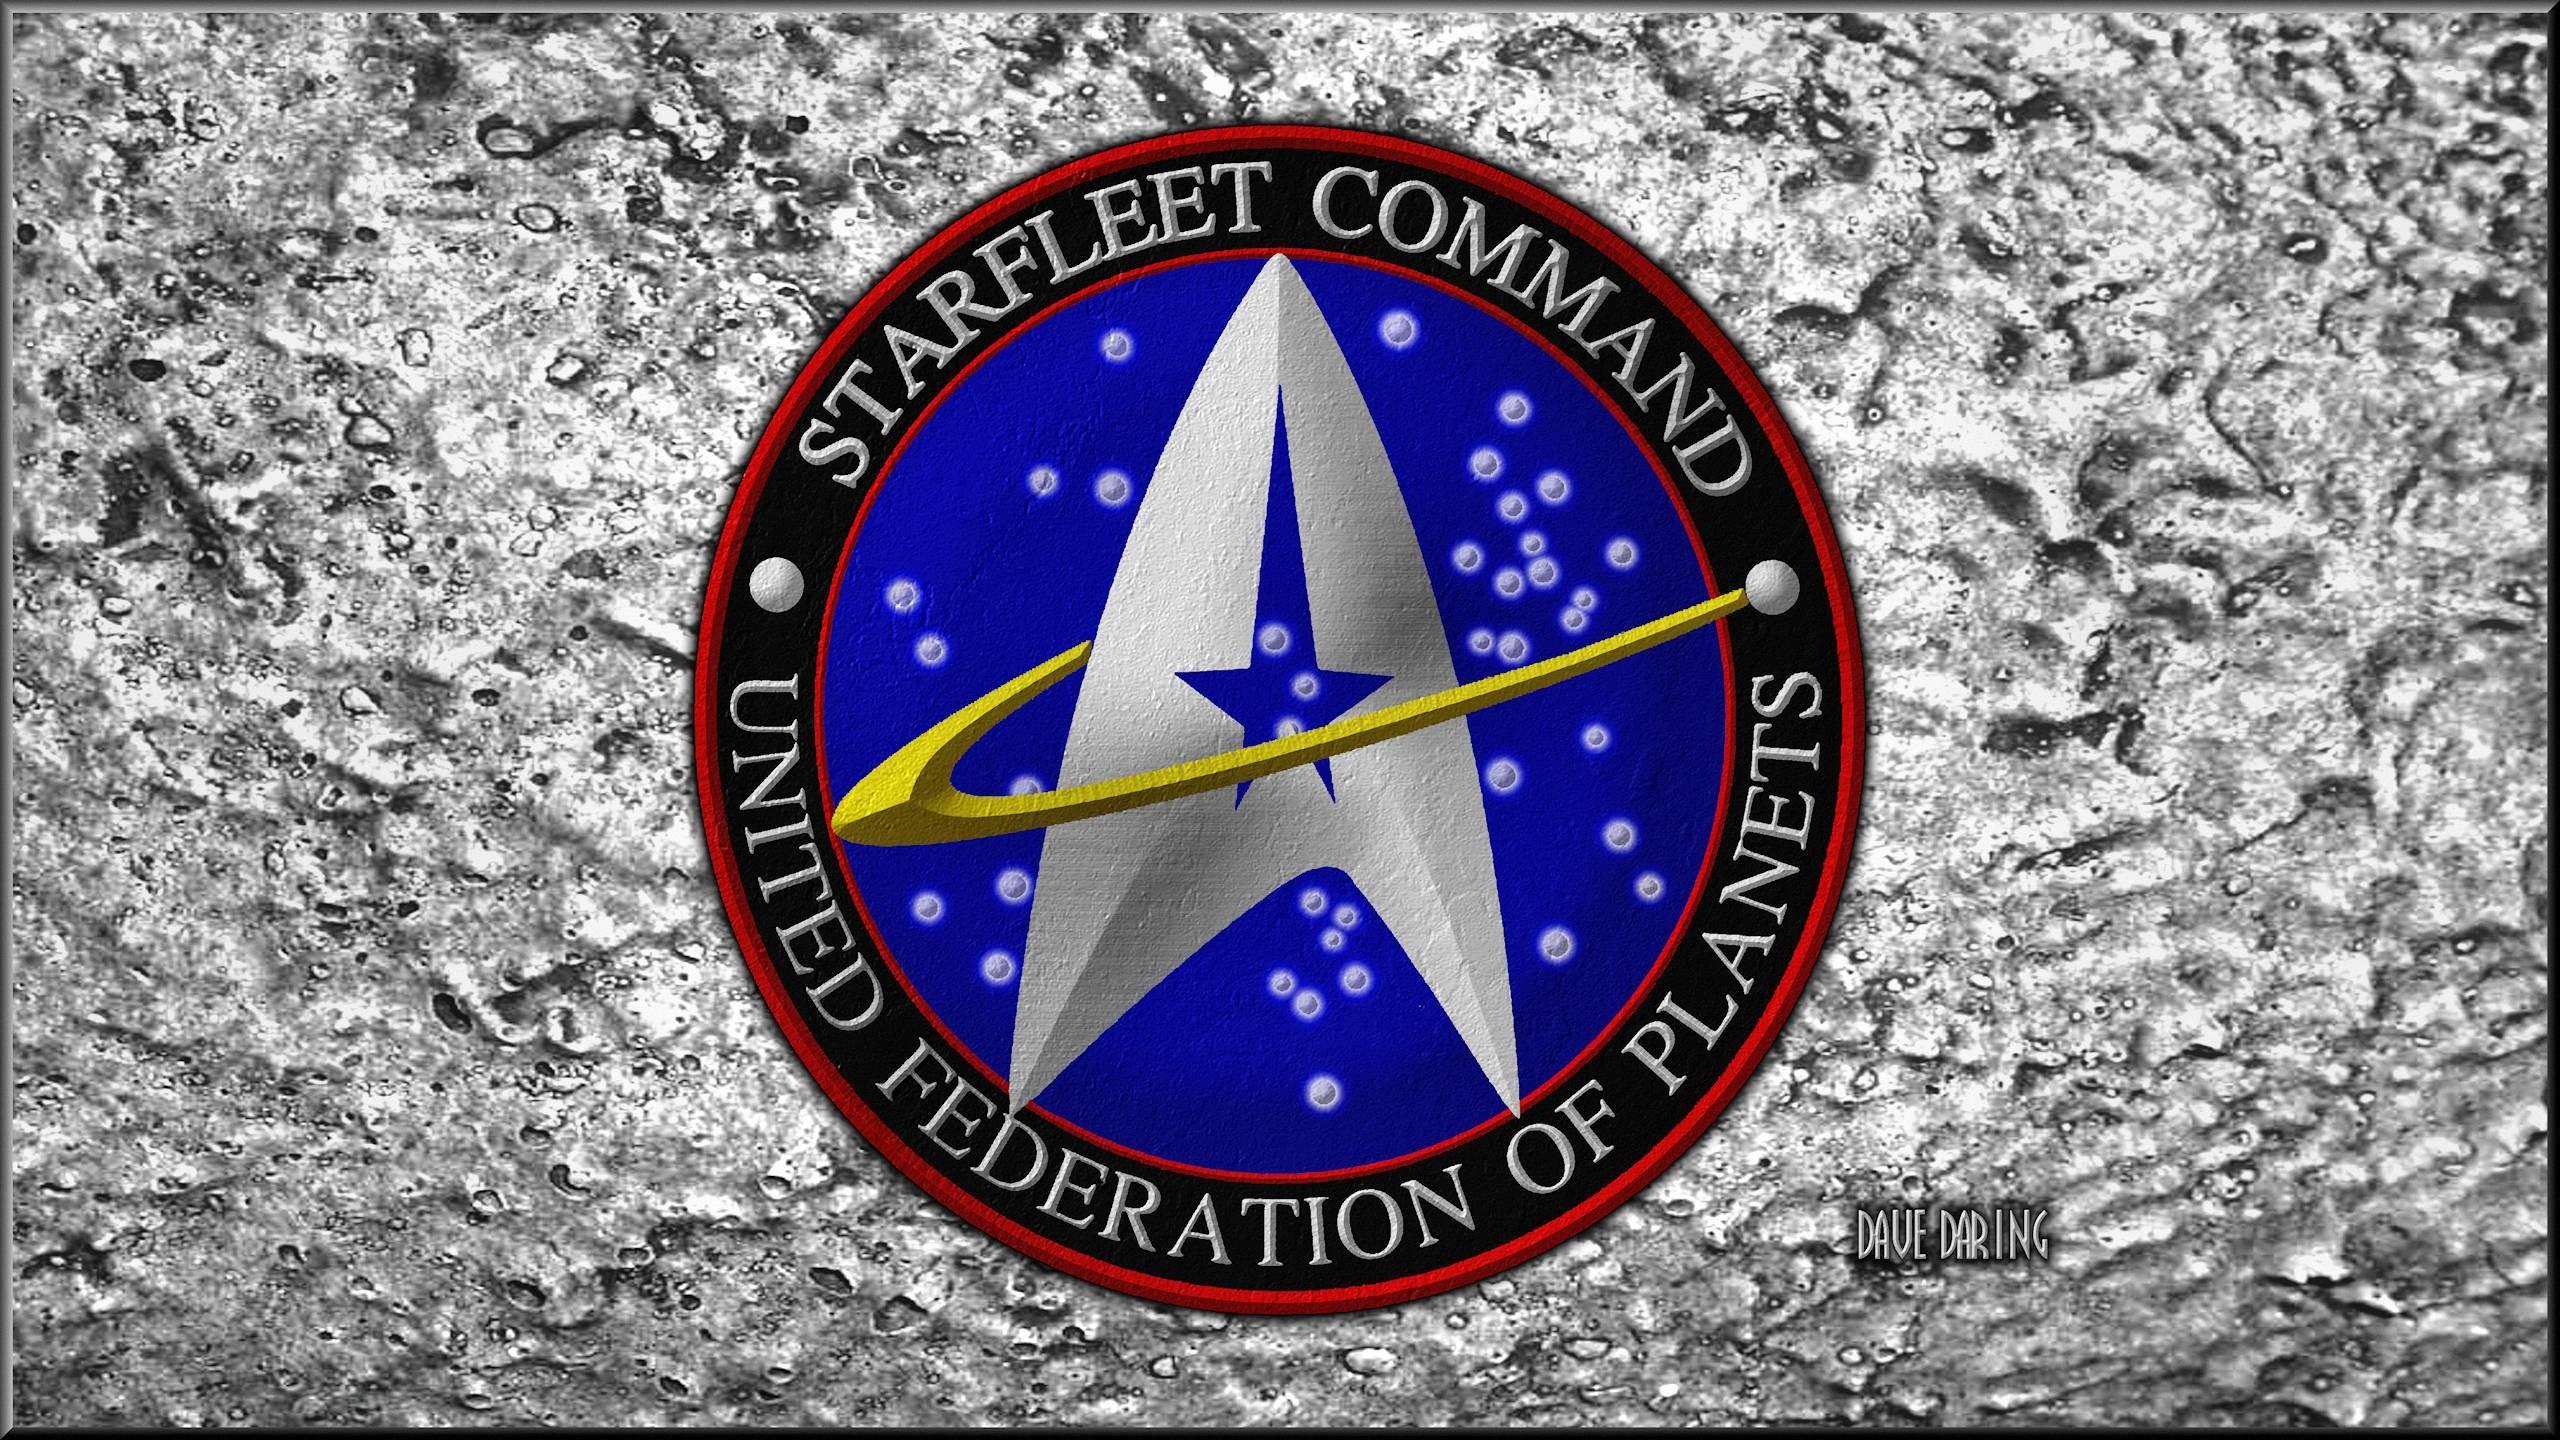 Star Trek Star Fleet Command Crest by Dave-Daring on .